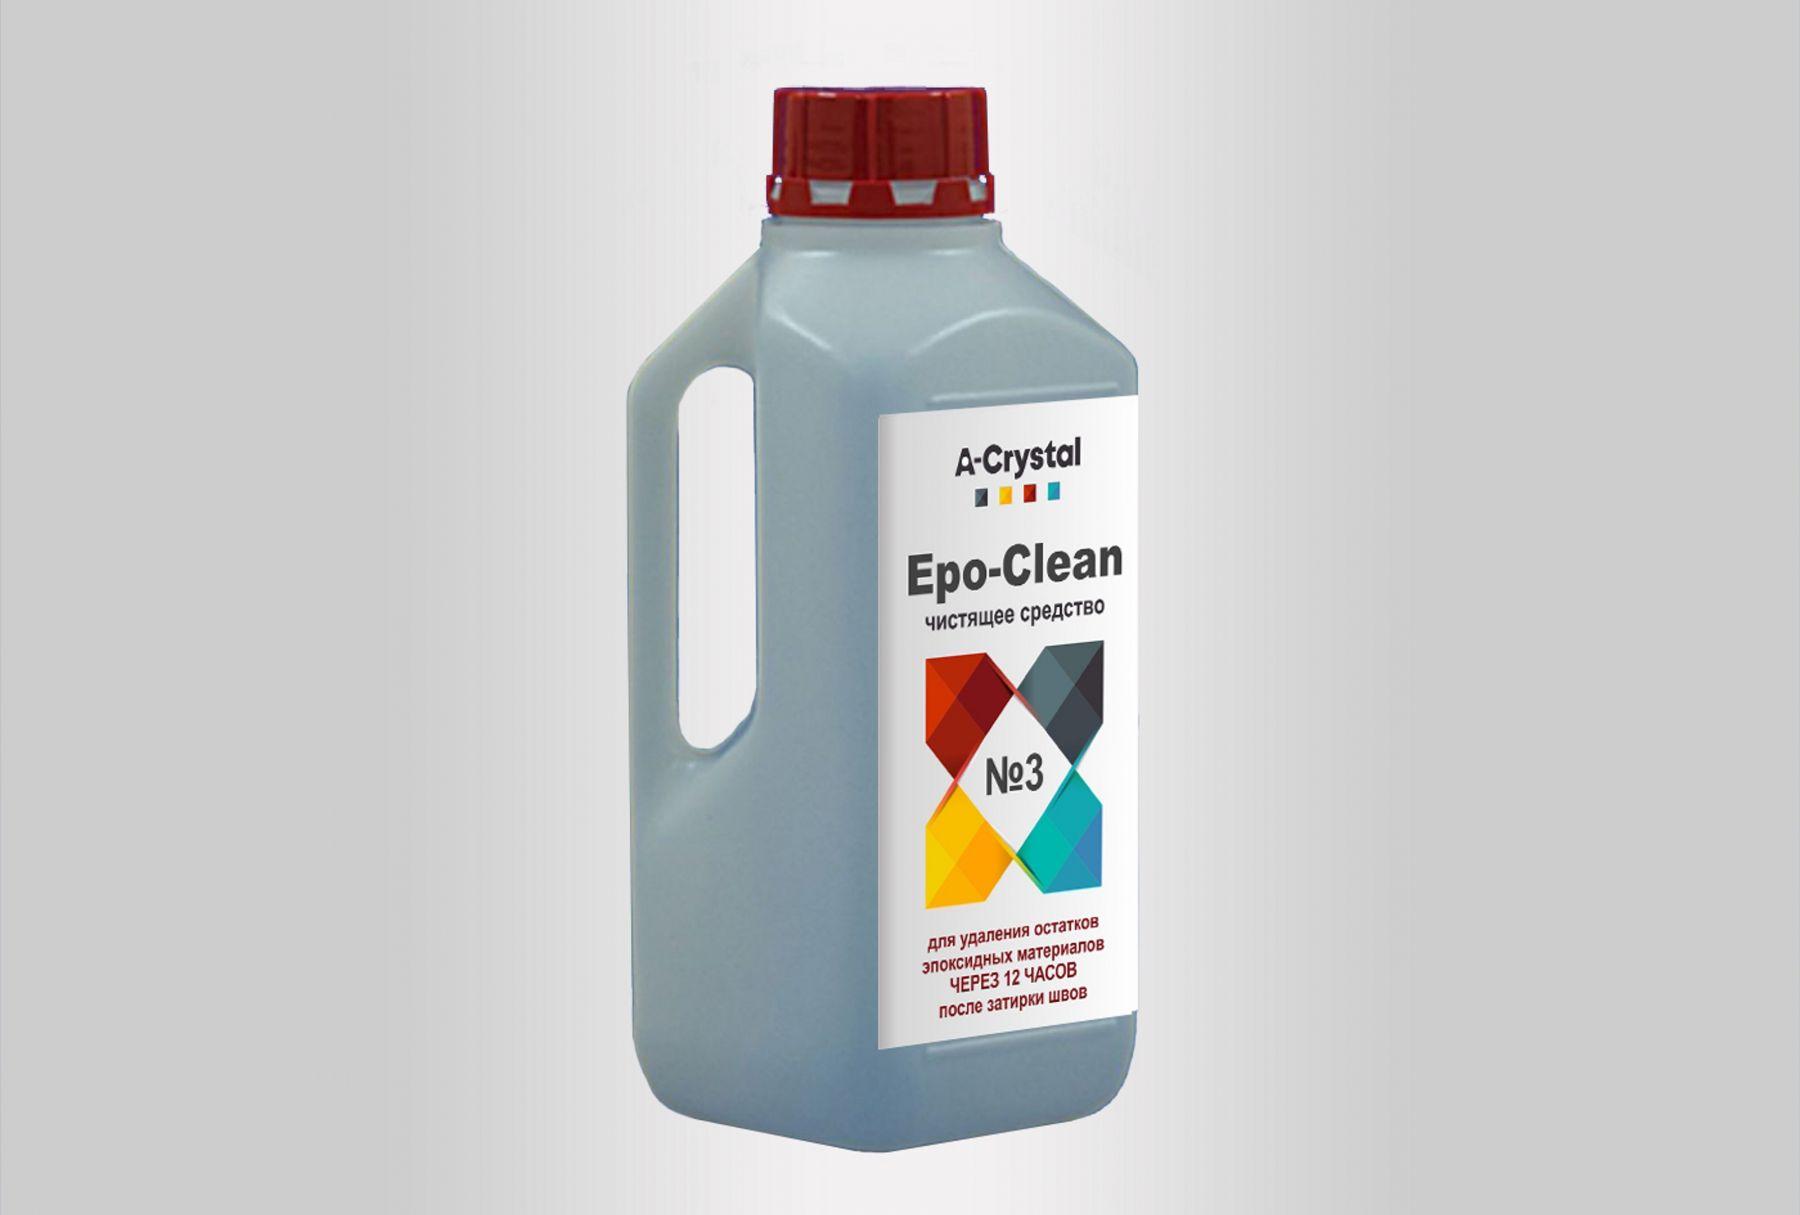 Очиститель затирки Epo-Clean №3 1 кг. 12 часов.